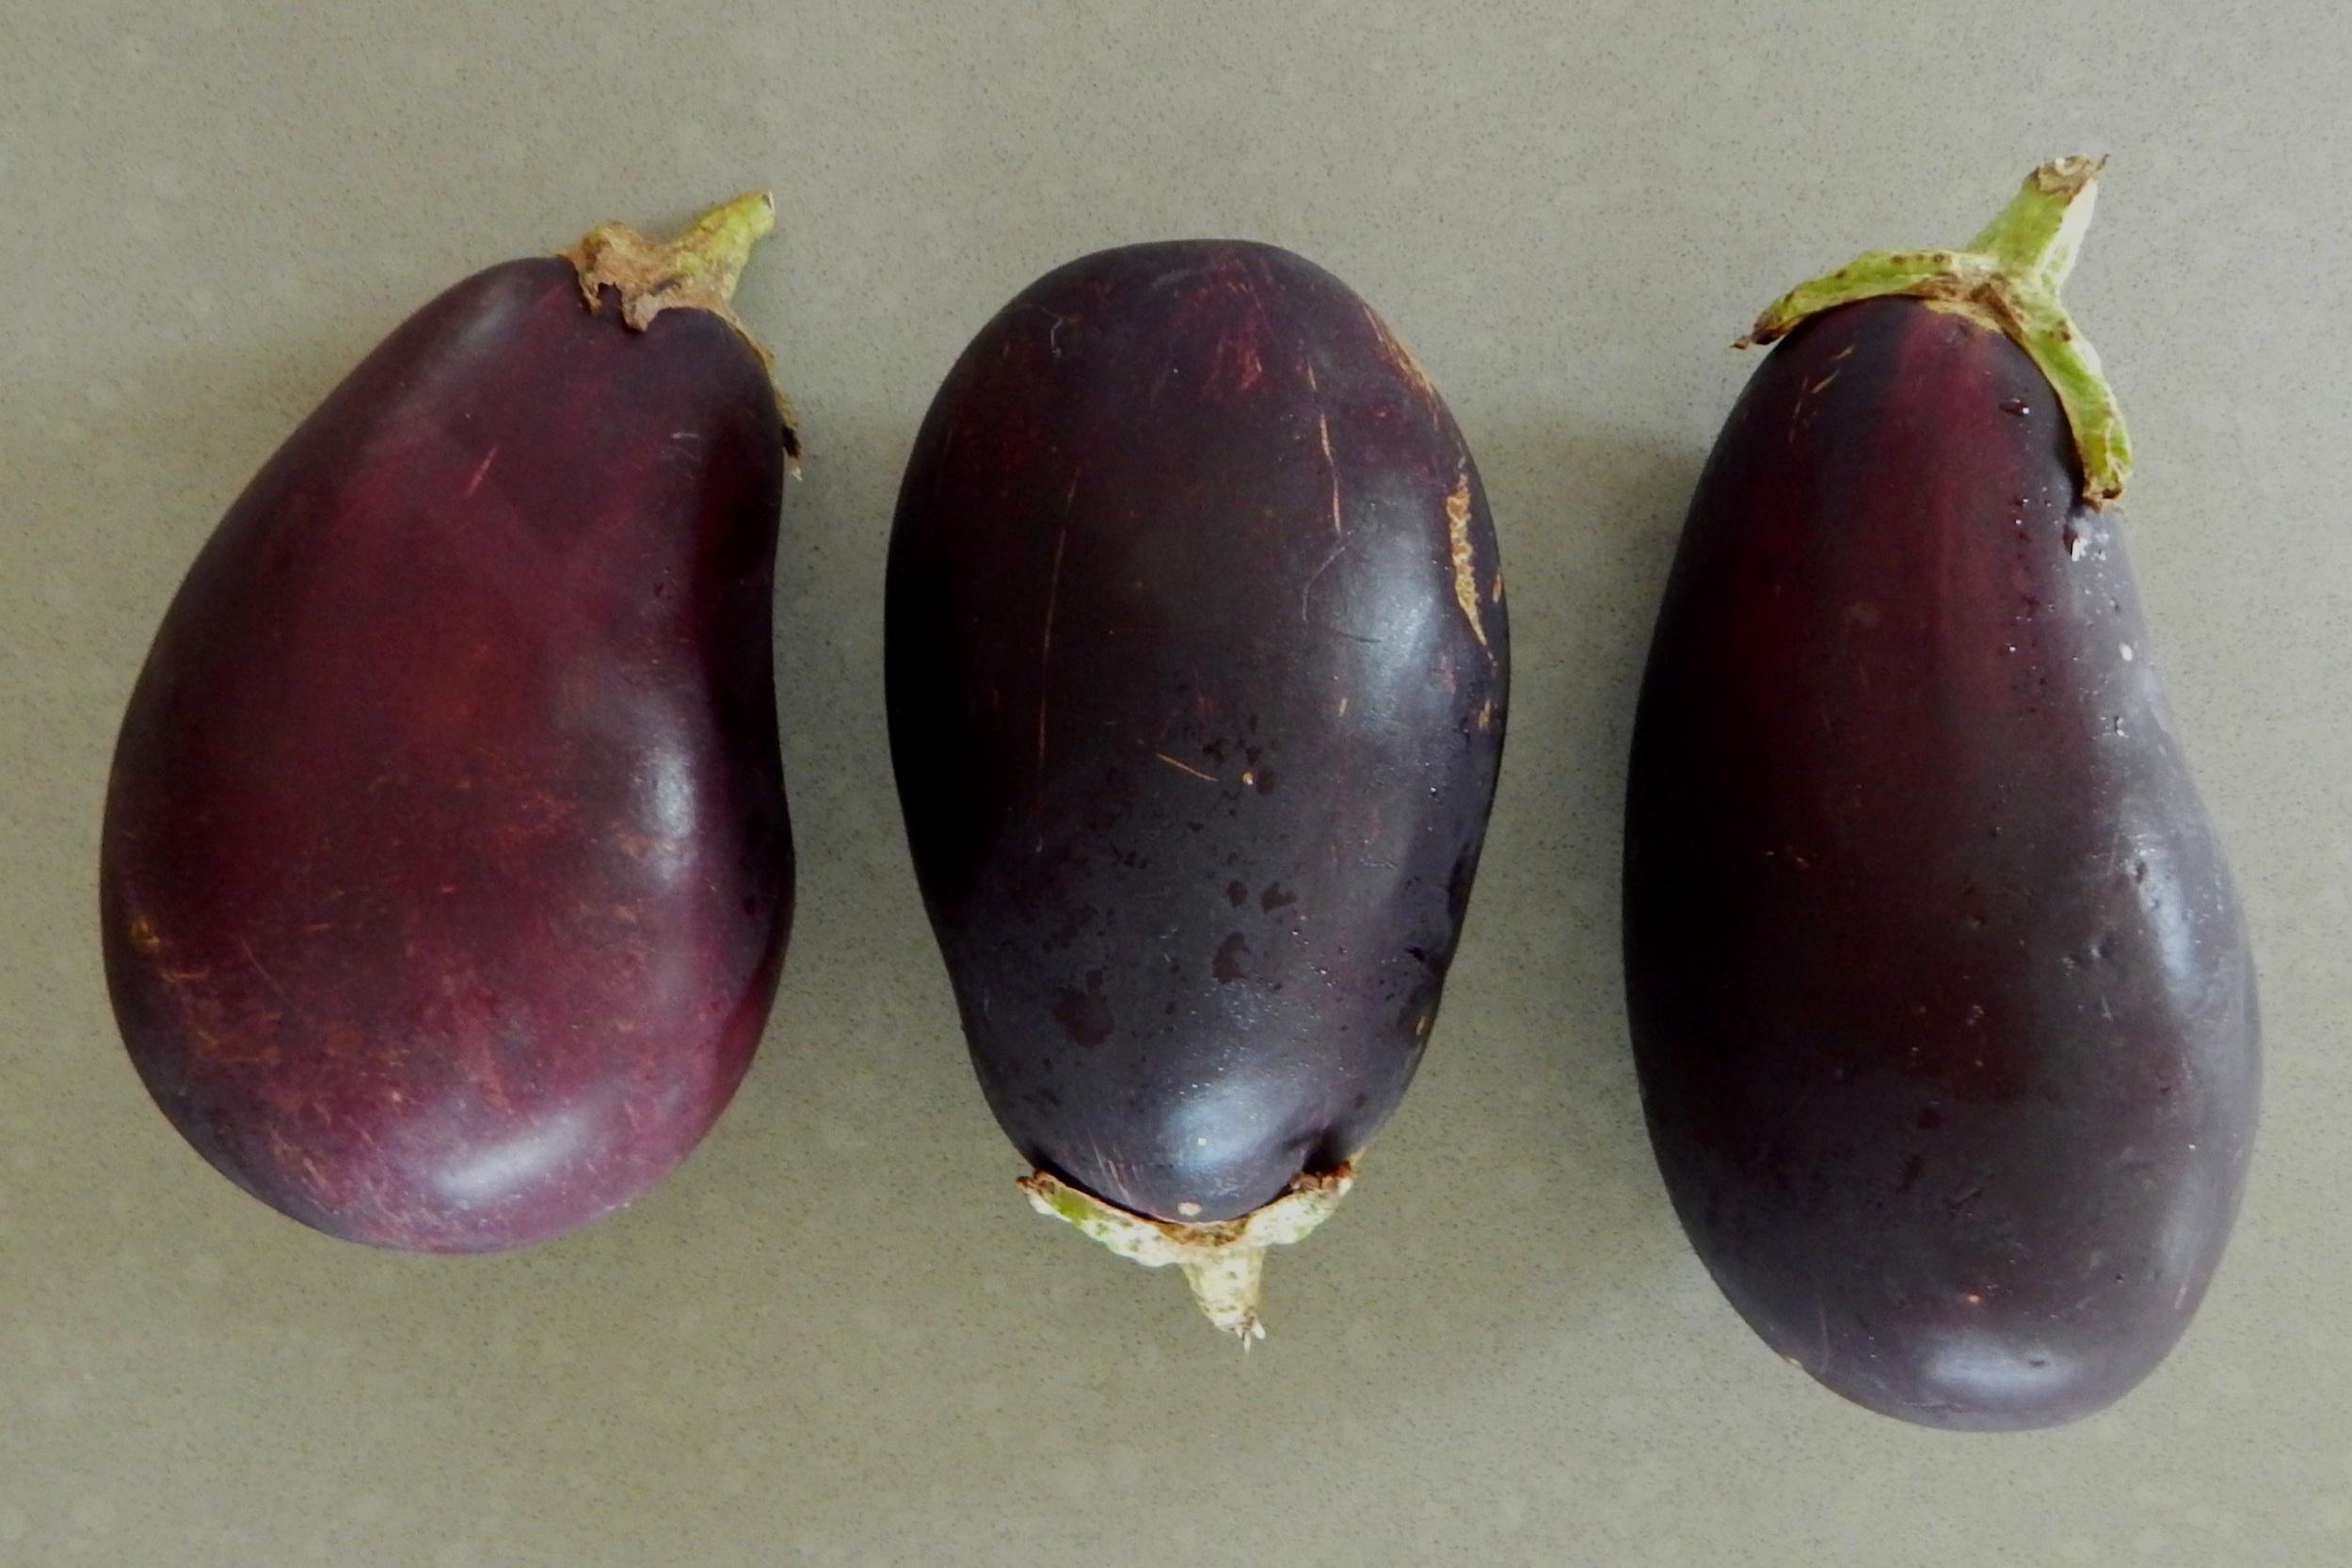 Eggplant2_8_5_19.jpg